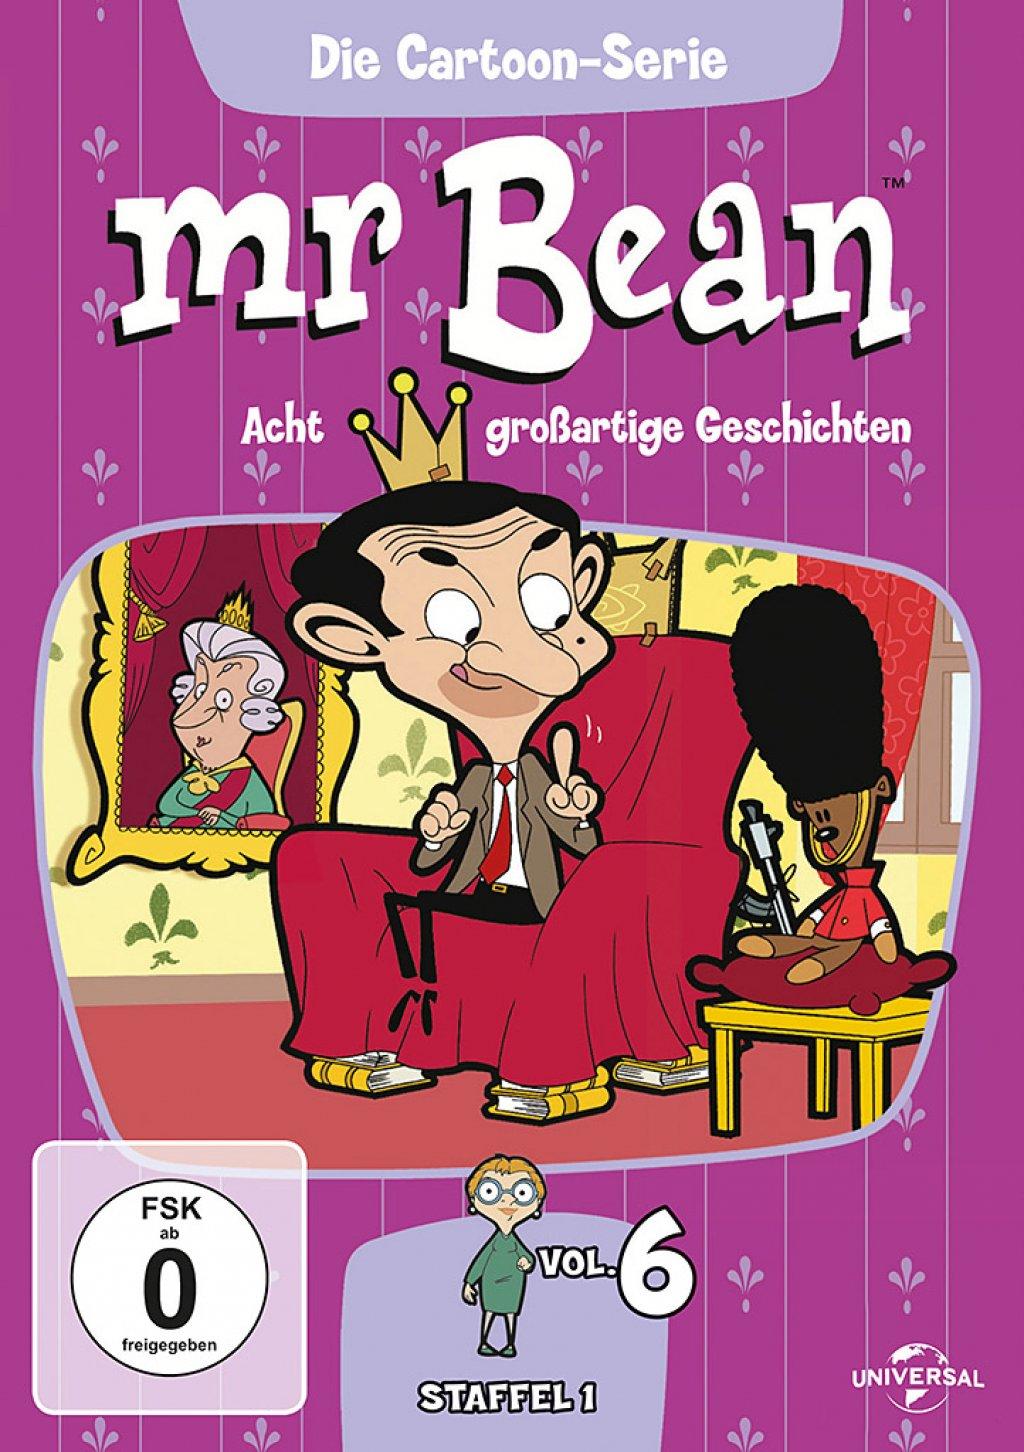 Mr. Bean - Die Cartoon Serie - Staffel 1 / Vol. 6 (DVD)